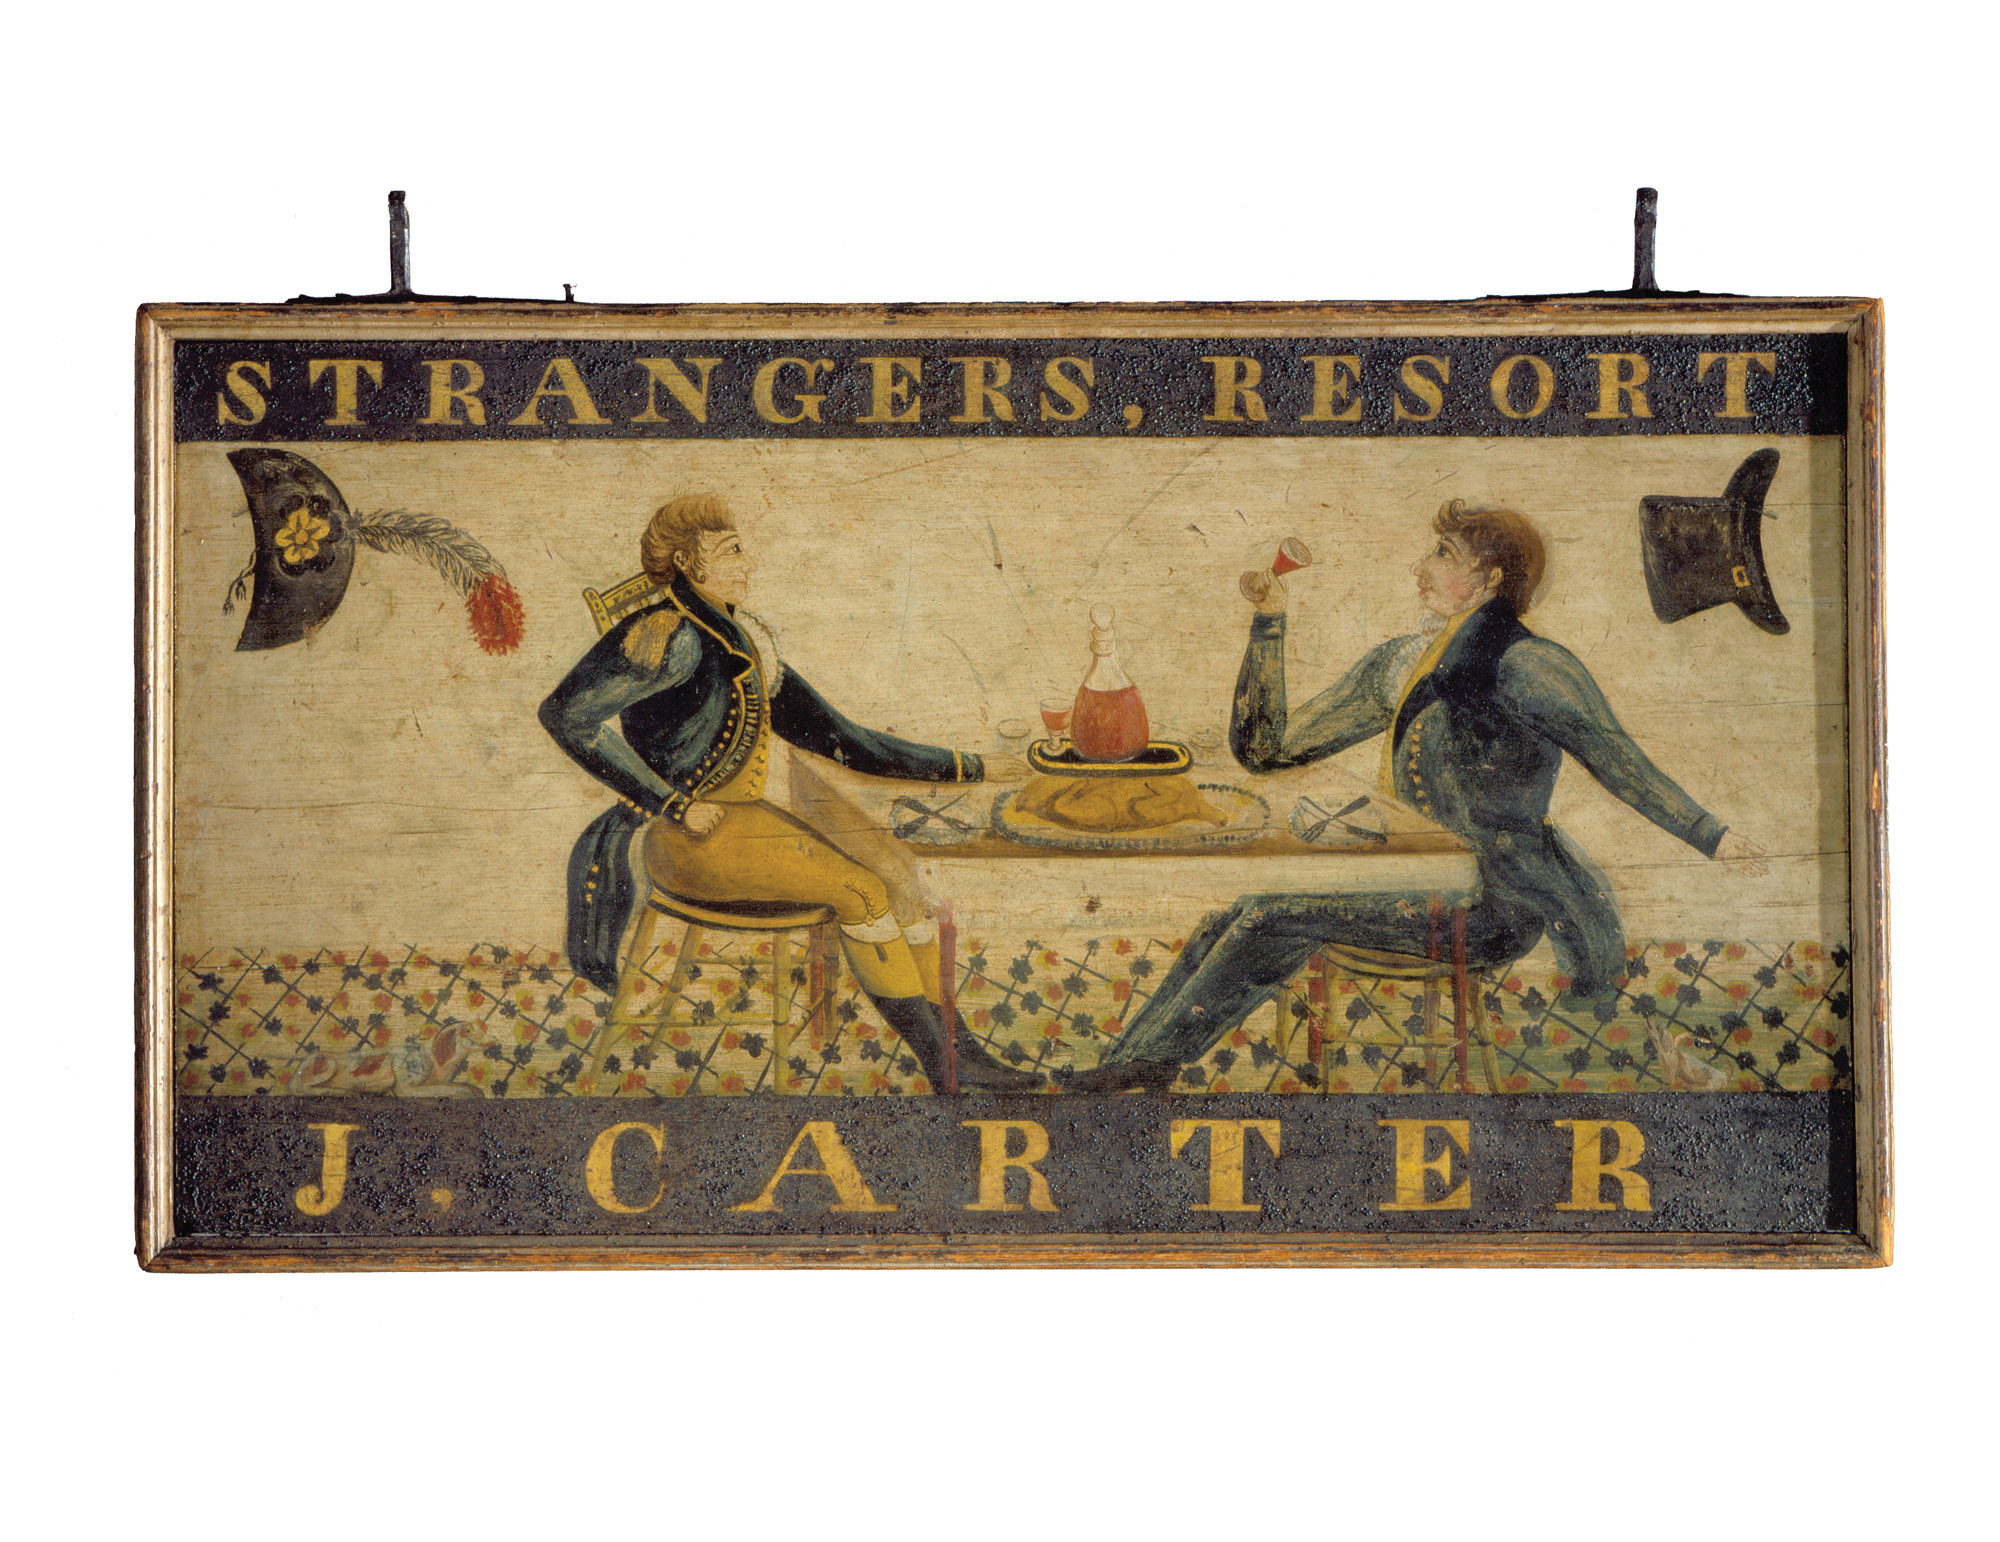 Carter's Inn sign, Clinton, Conn., ca. 1823, attributed to Solomon Jones & Thomas K. Bush.